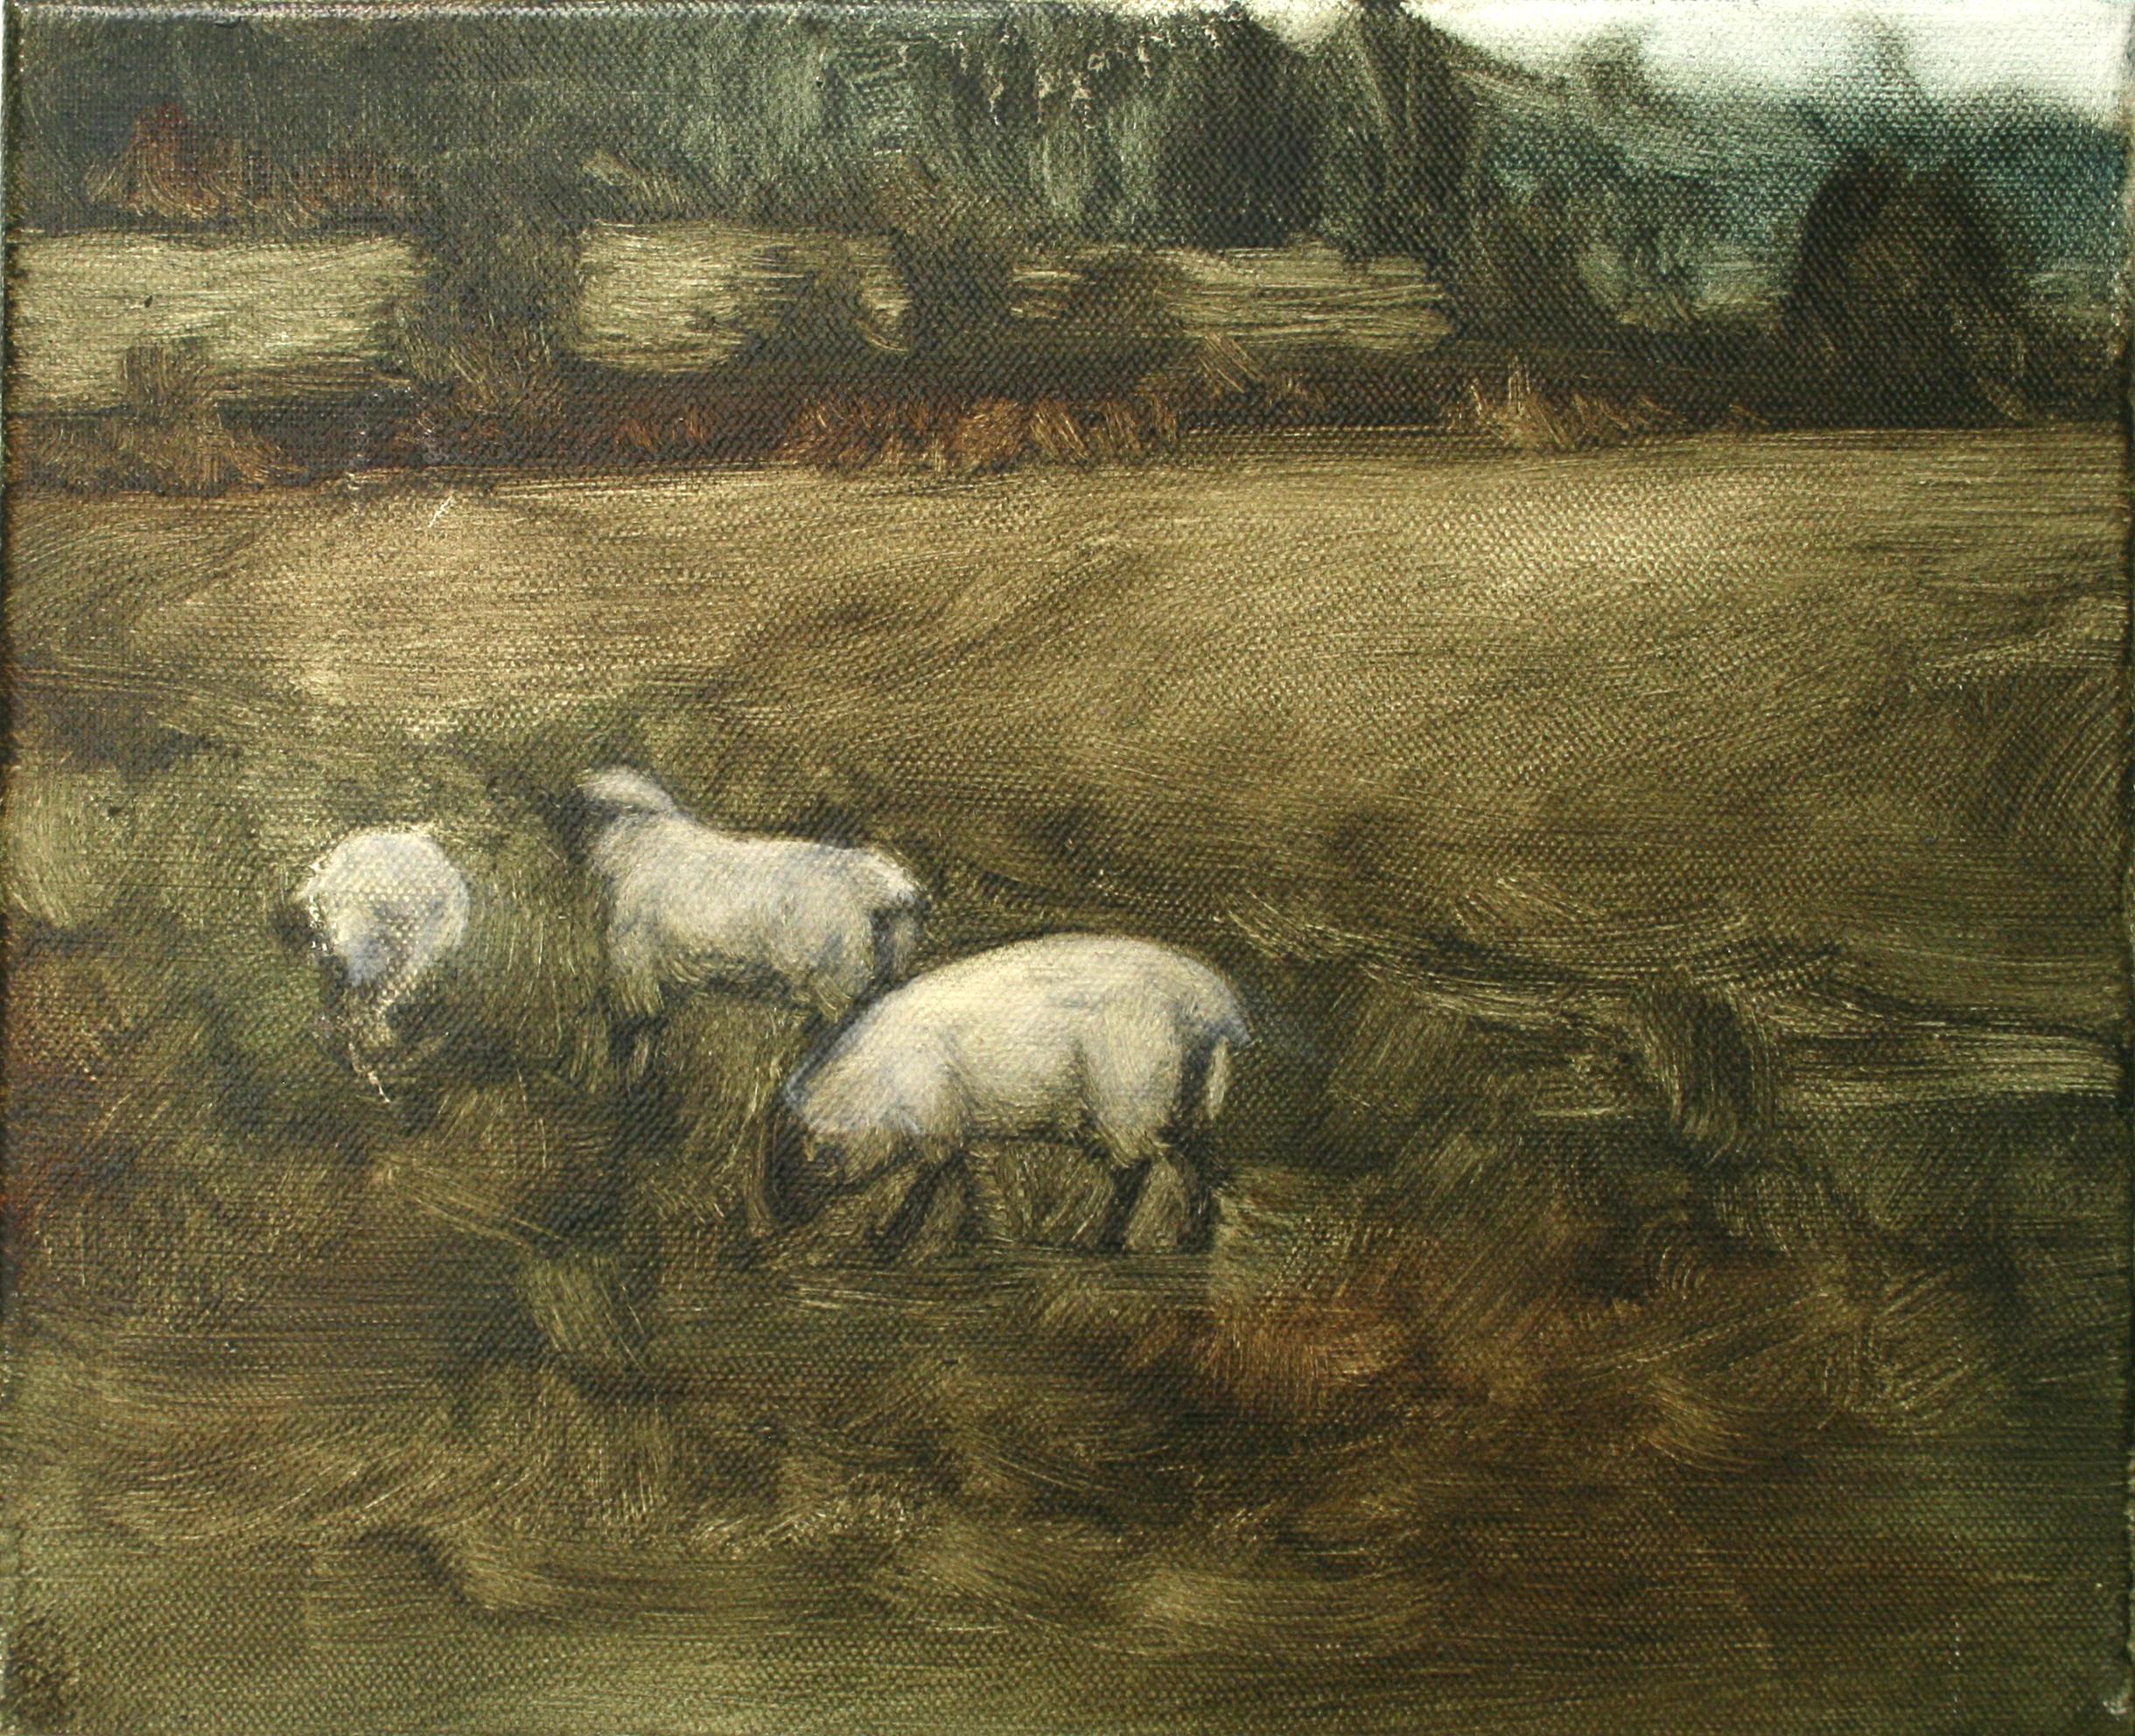 "Sheep Study 2, oil on canvas 30 x 24.5 cm (12"" x 9.5""), 2016"